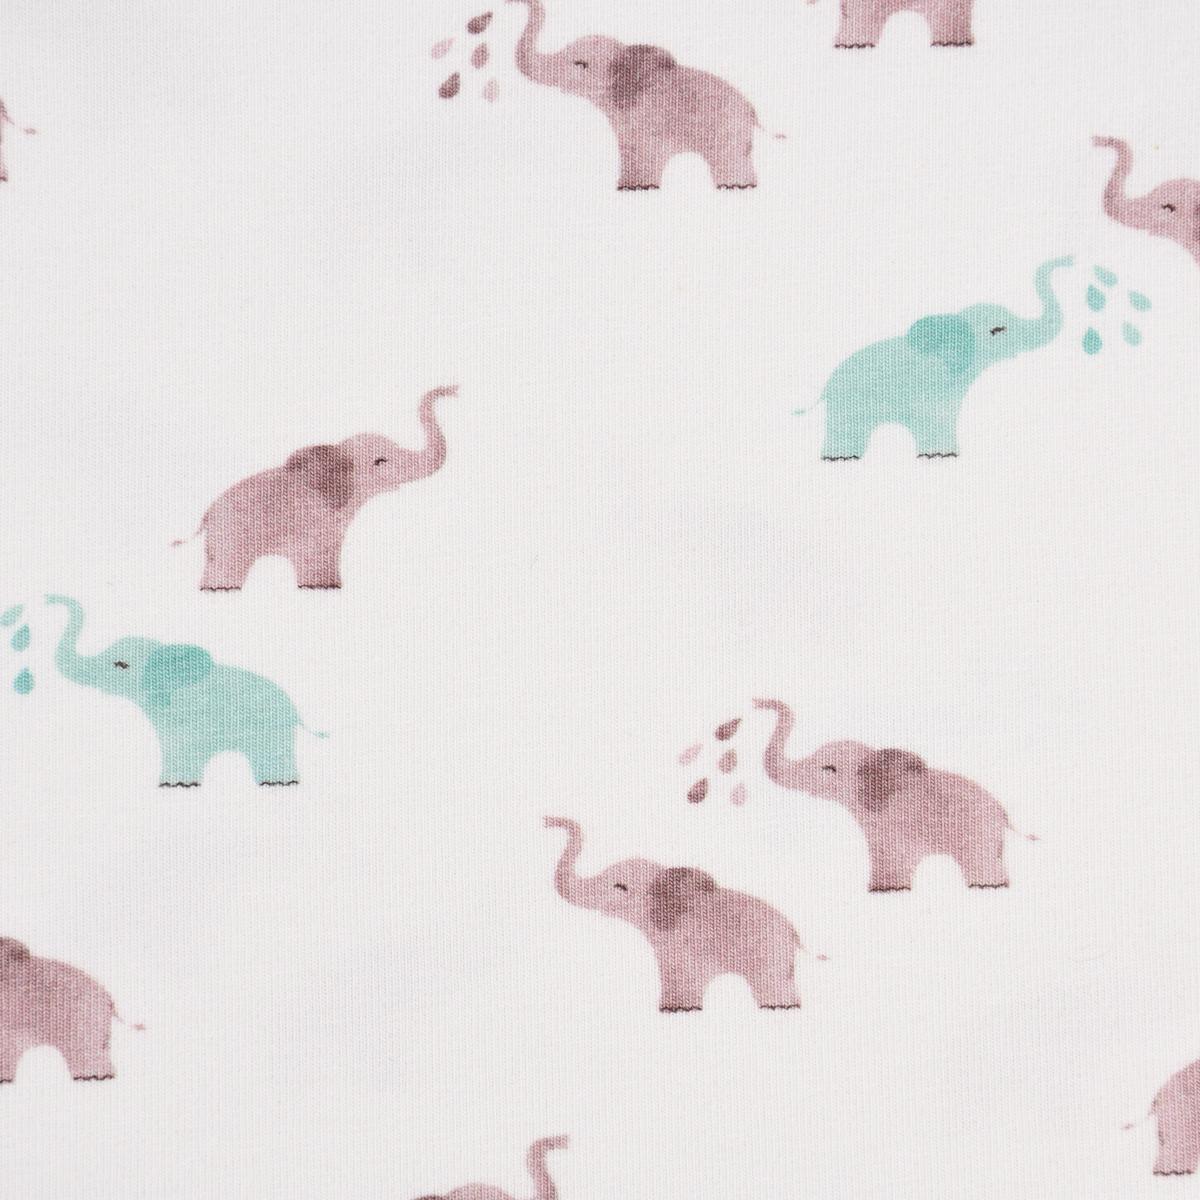 Baumwolljersey Digitaldruck Elefanten weiß altrosa mint 1,5m Breite